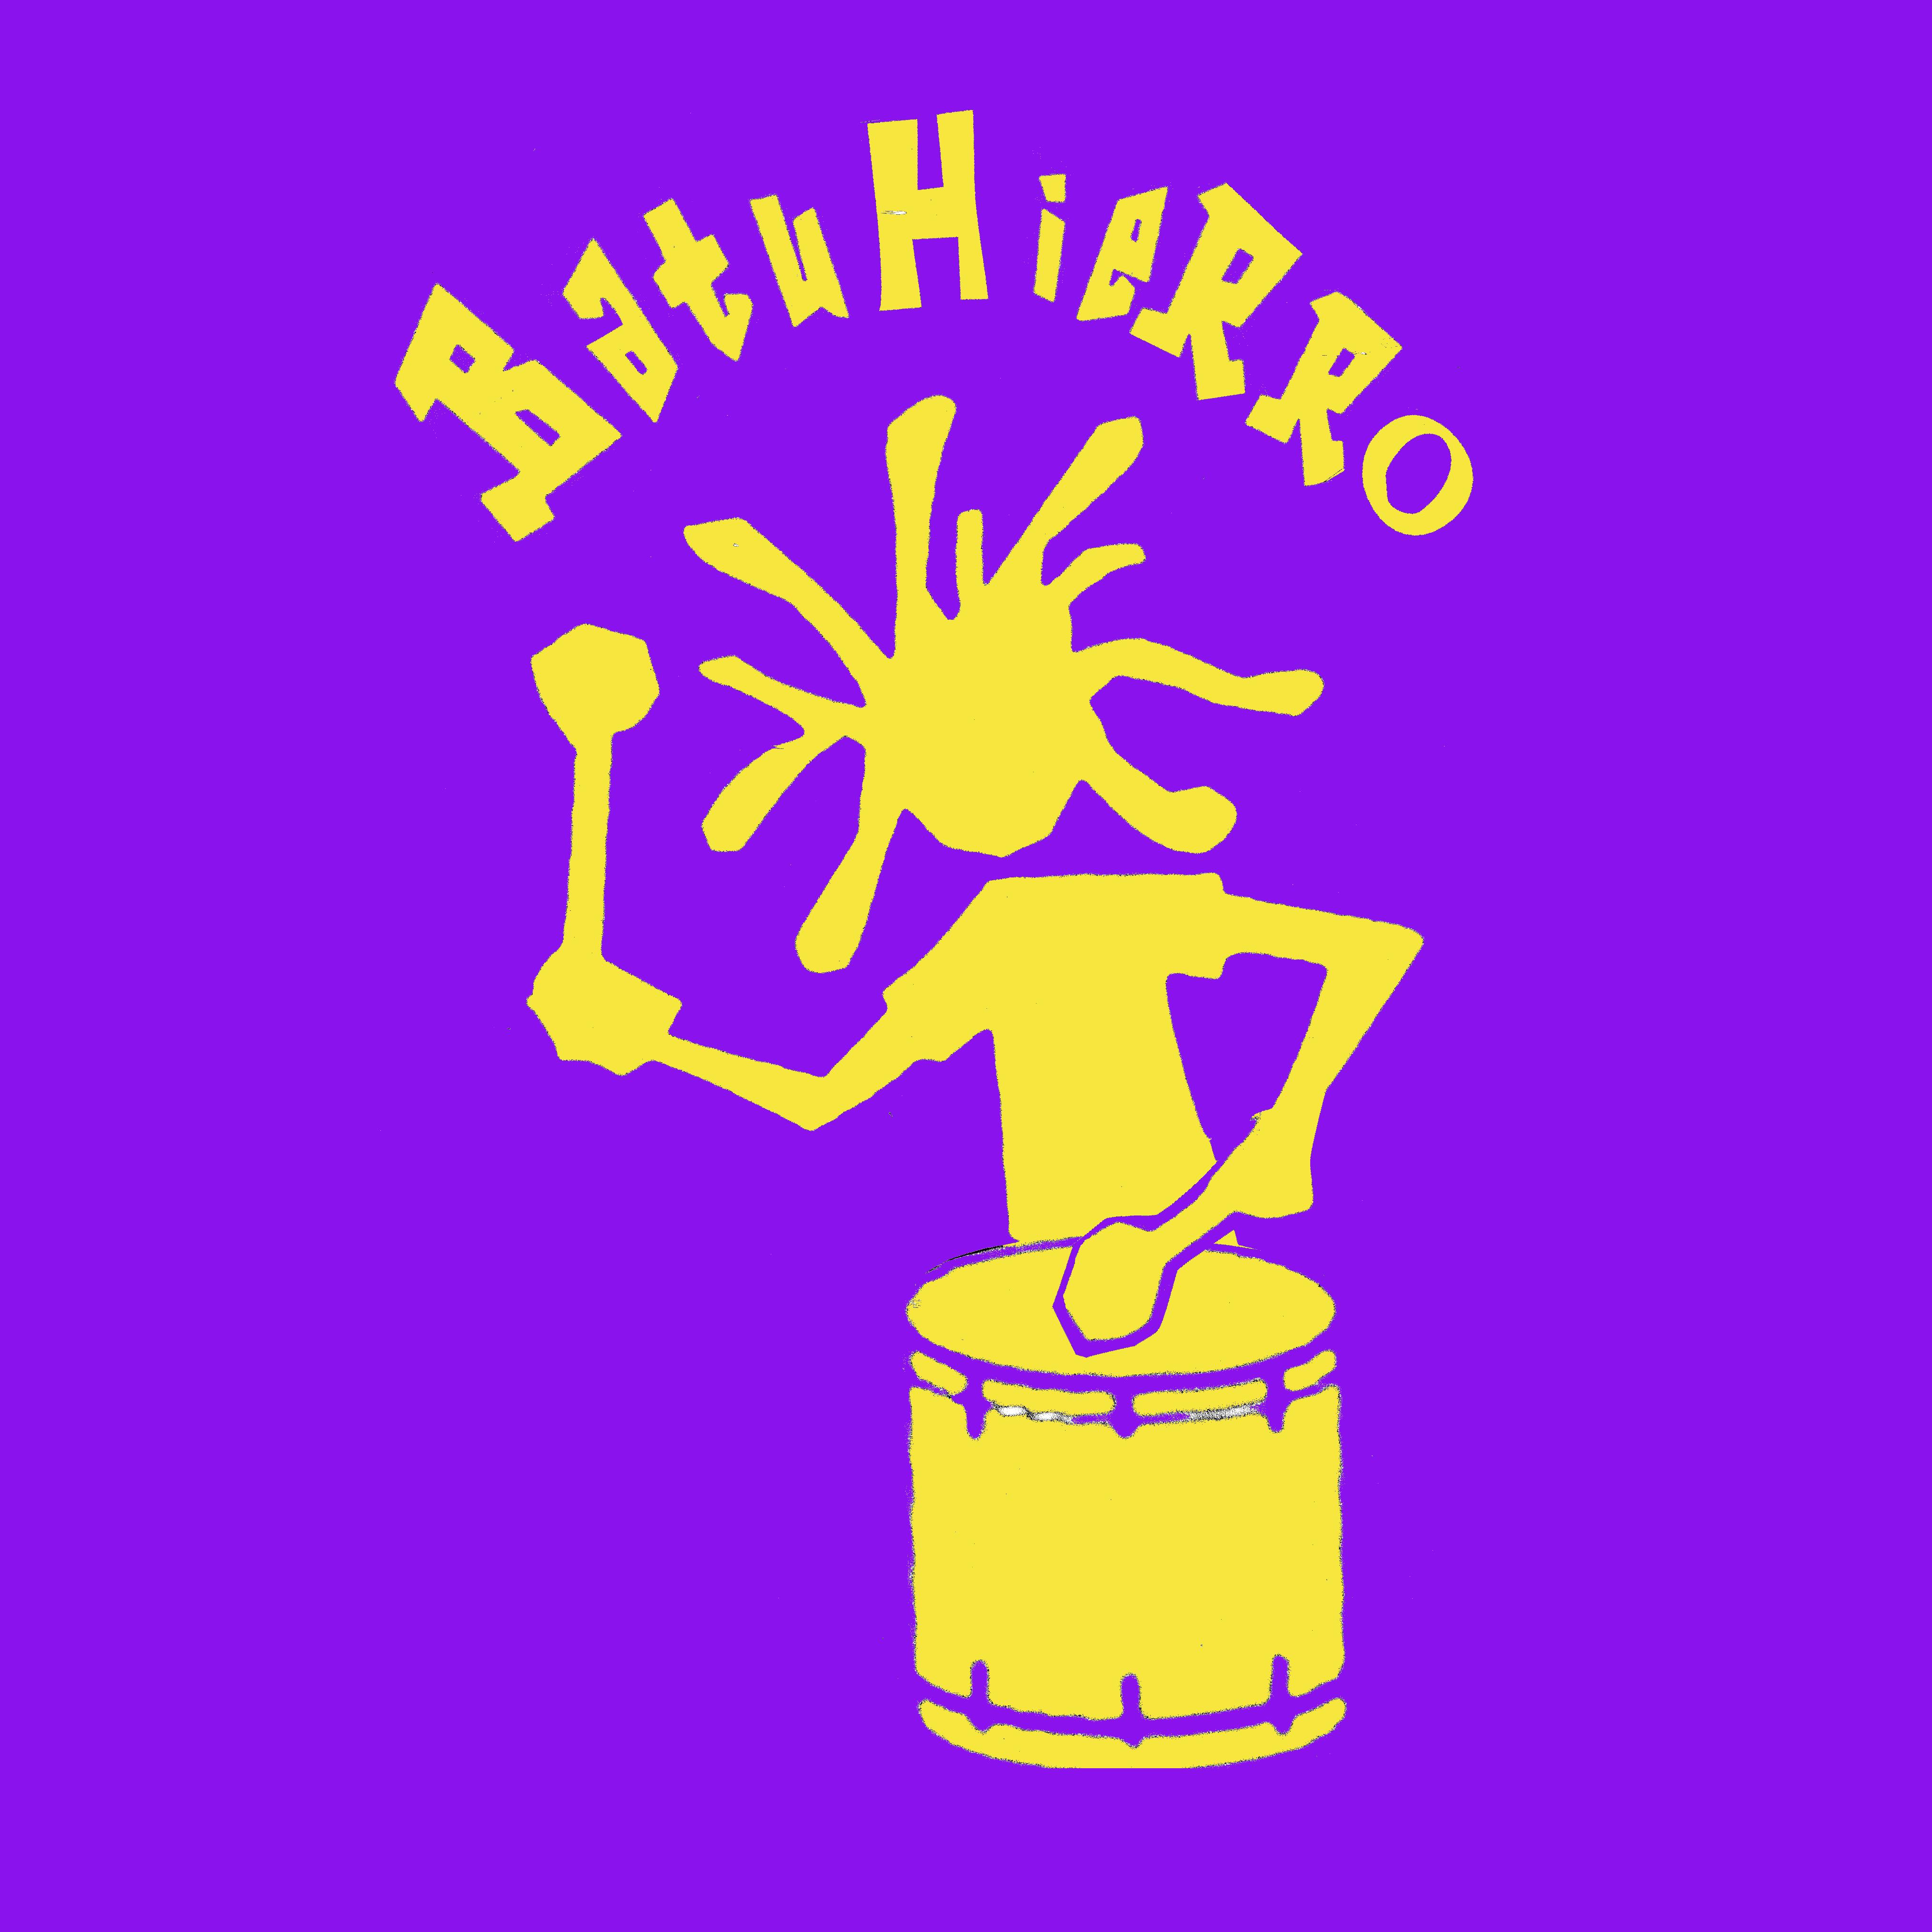 Batuhierro profile, rate, communicate and discover